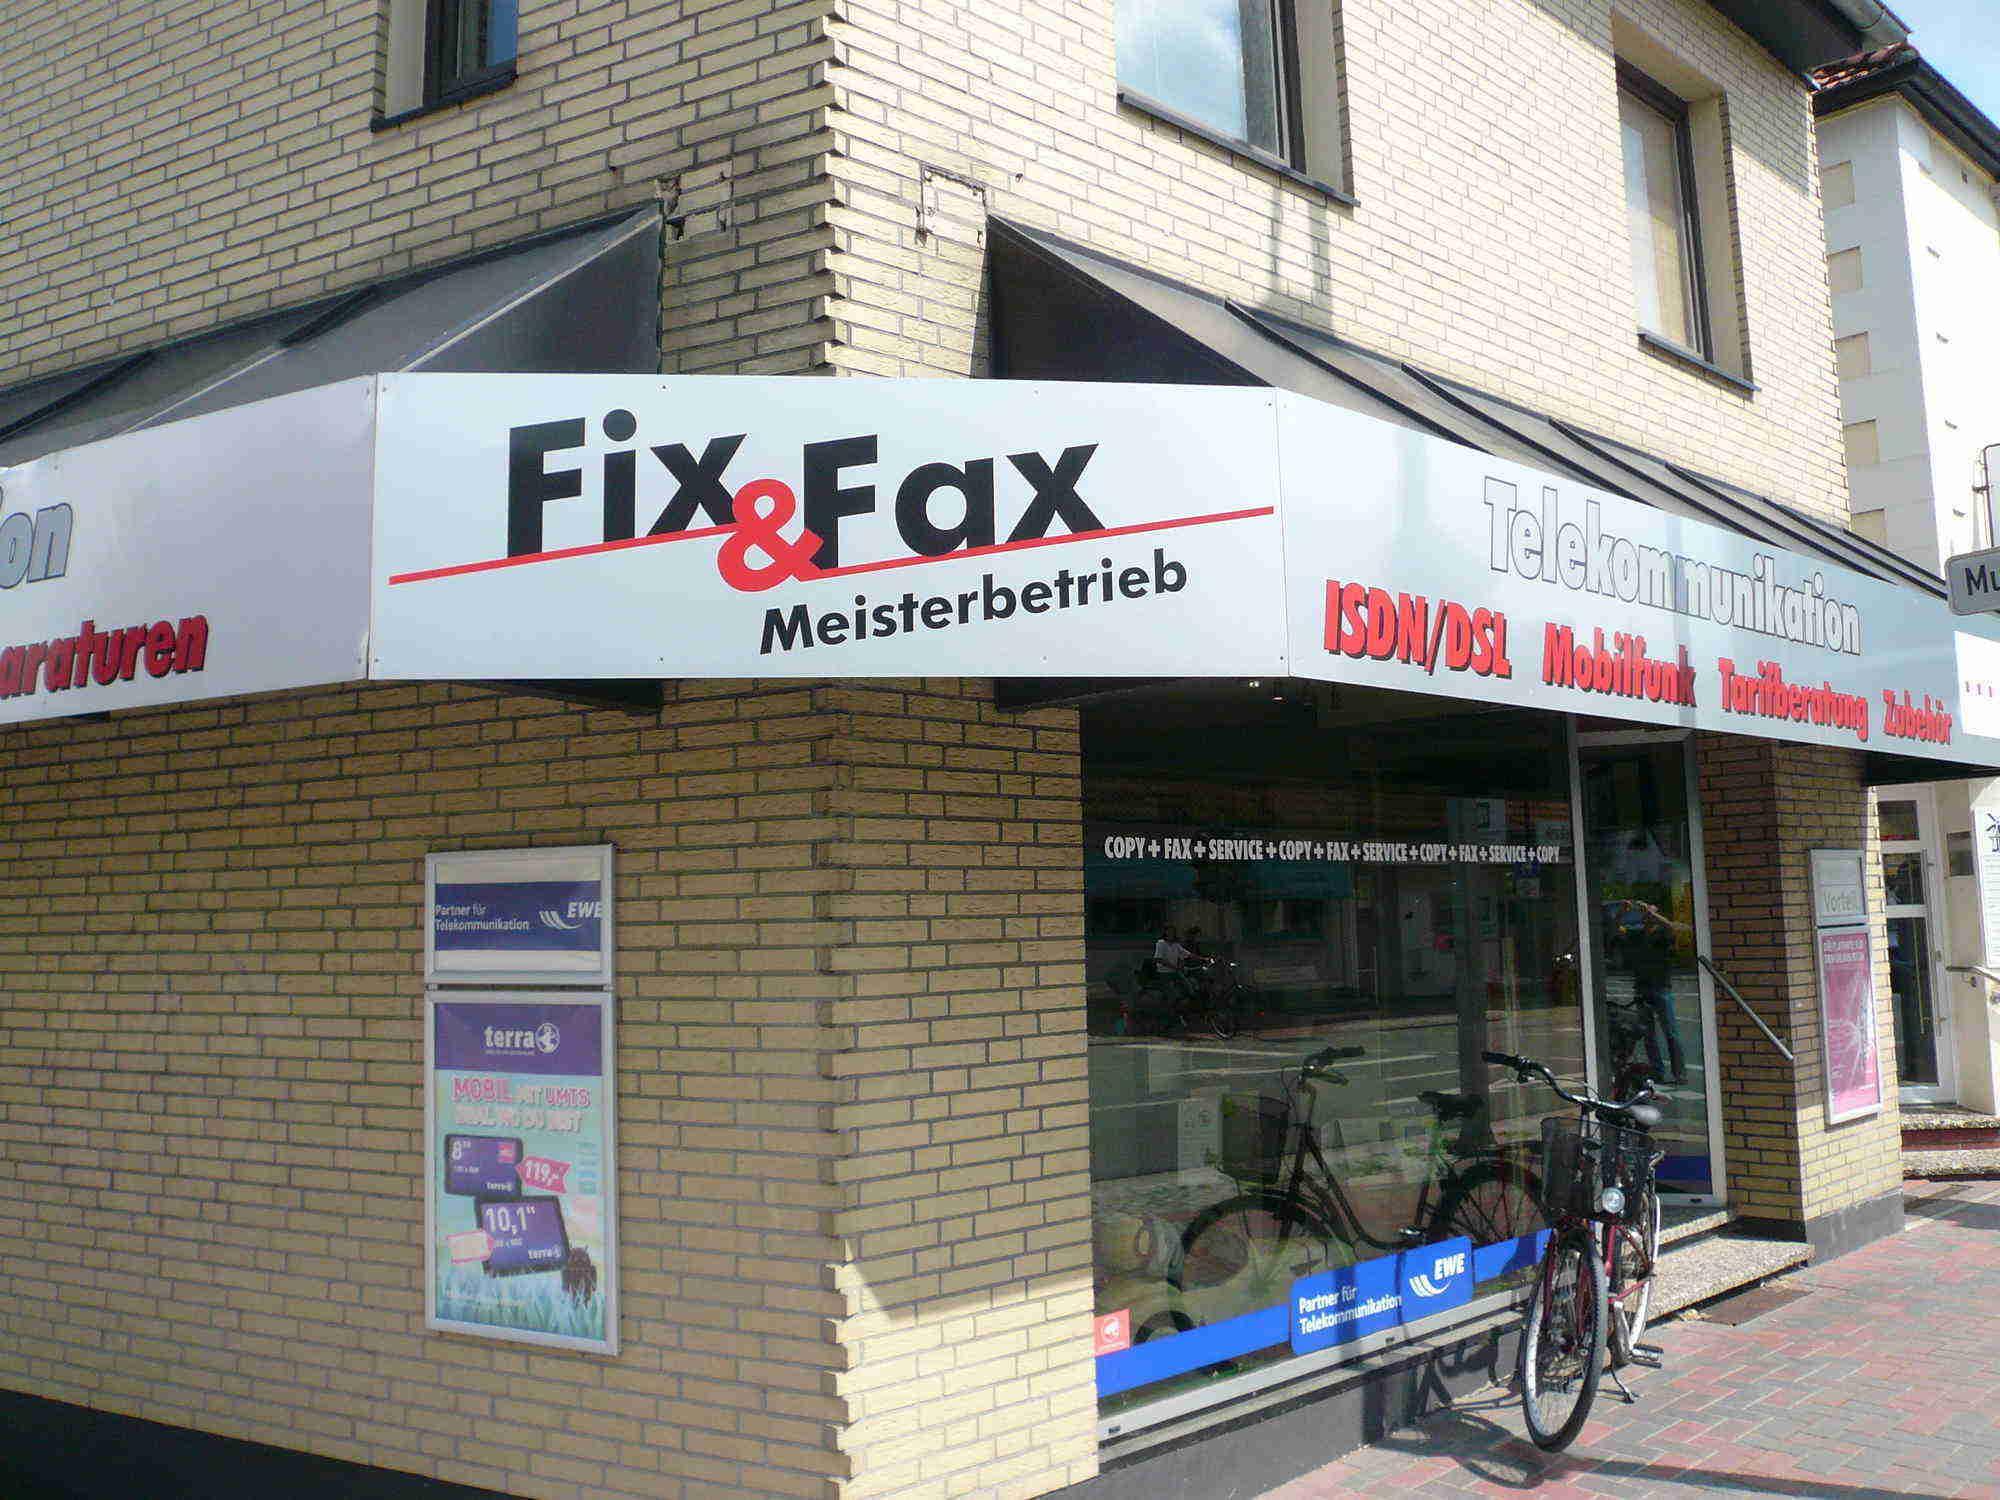 smartphone reparatur harpstedt region bremen fix fax. Black Bedroom Furniture Sets. Home Design Ideas